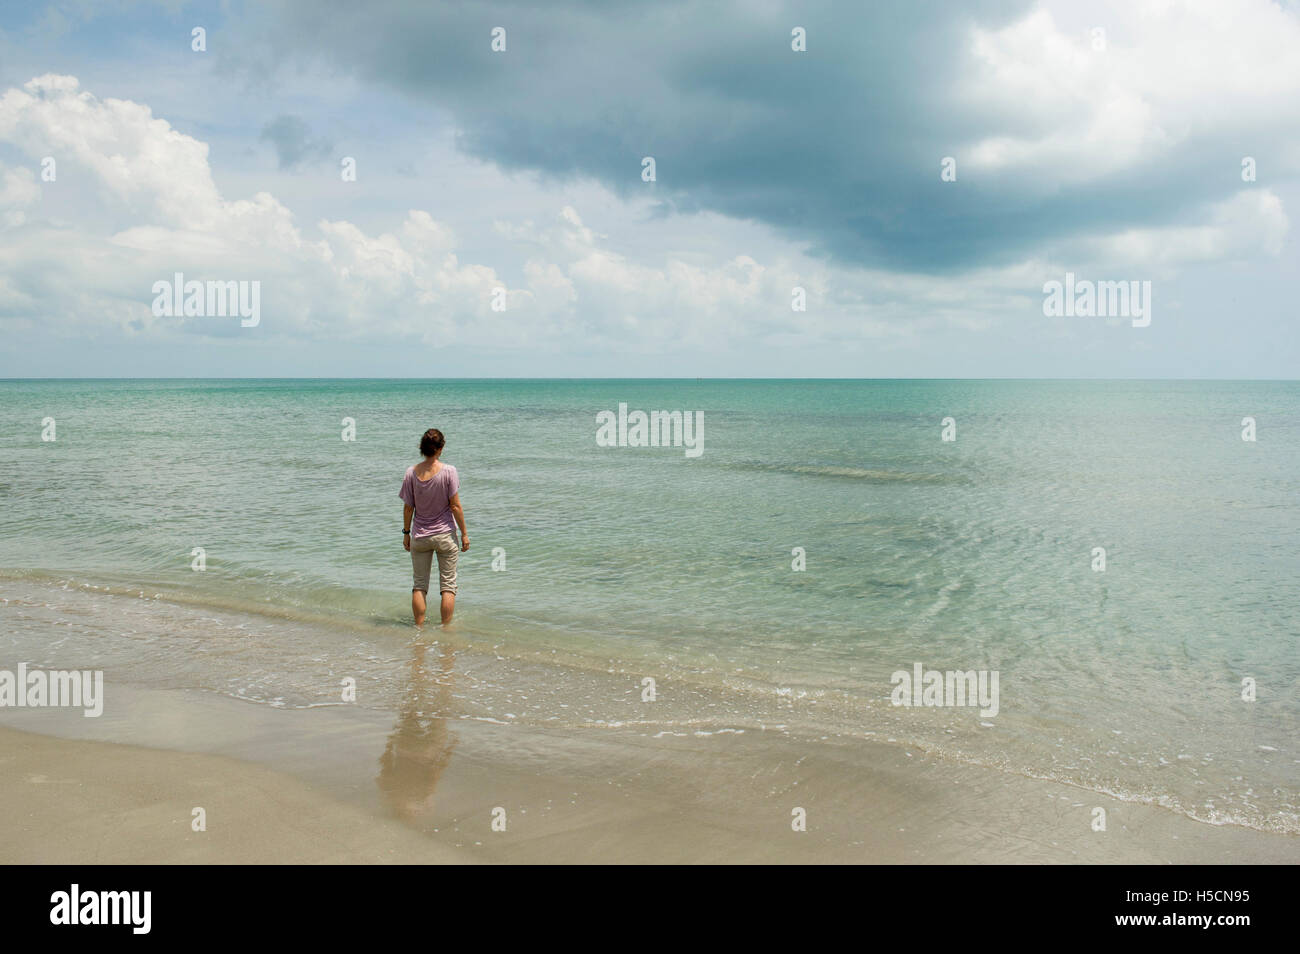 Tourist on Casuarina beach, Karainagar, Jaffna Peninsula, Sri Lanka - Stock Image